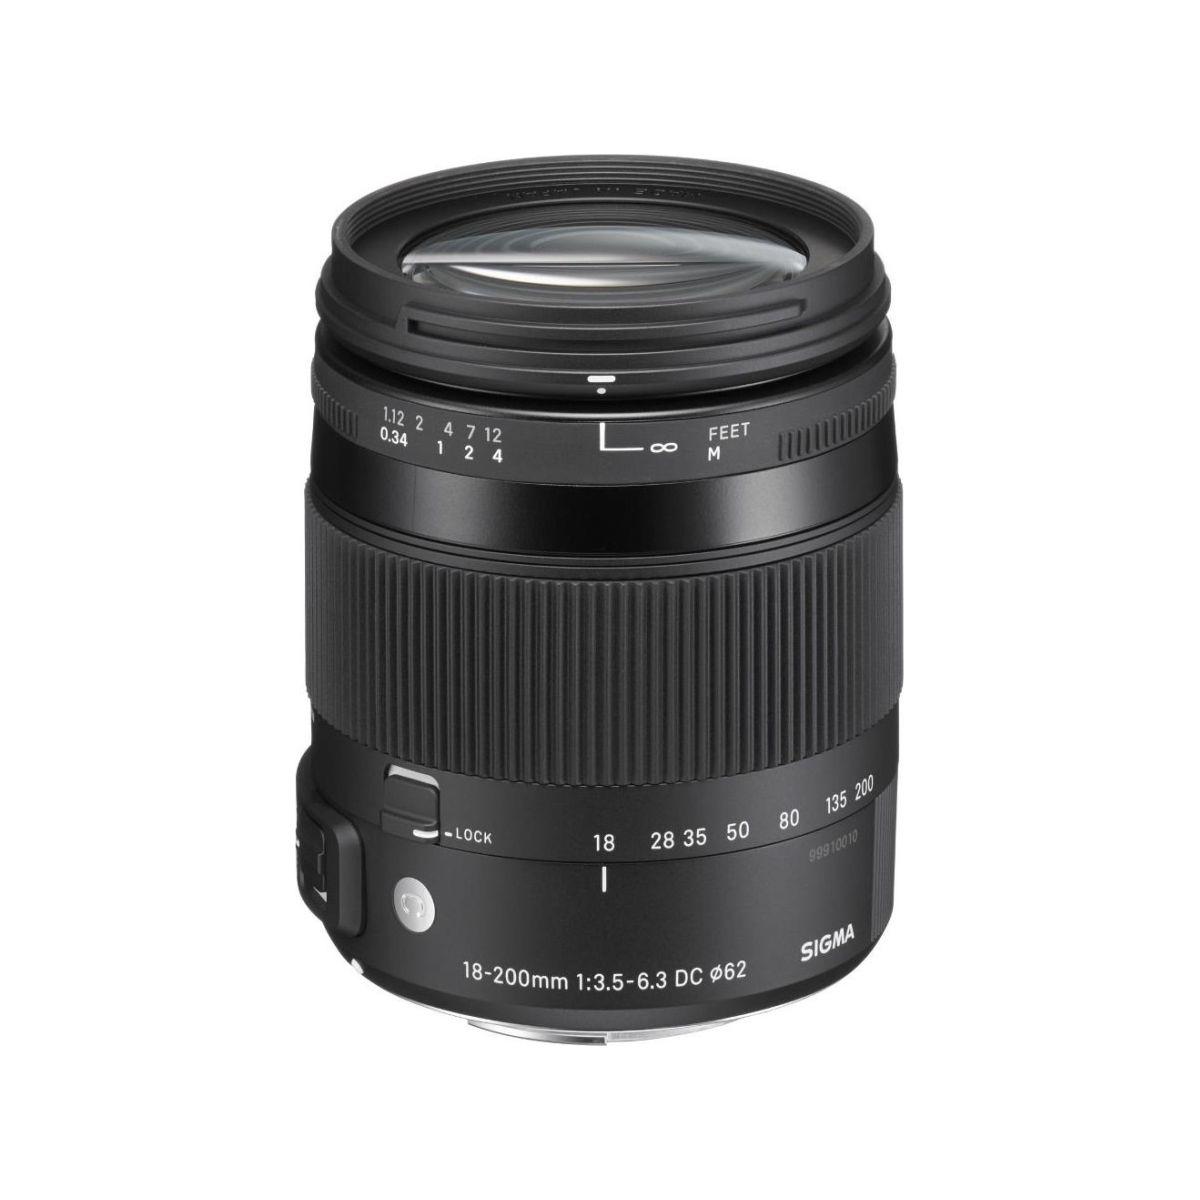 Objectif pour Reflex SIGMA 18-200mm f/3.5-6.3 Macro DC OS HSM ...